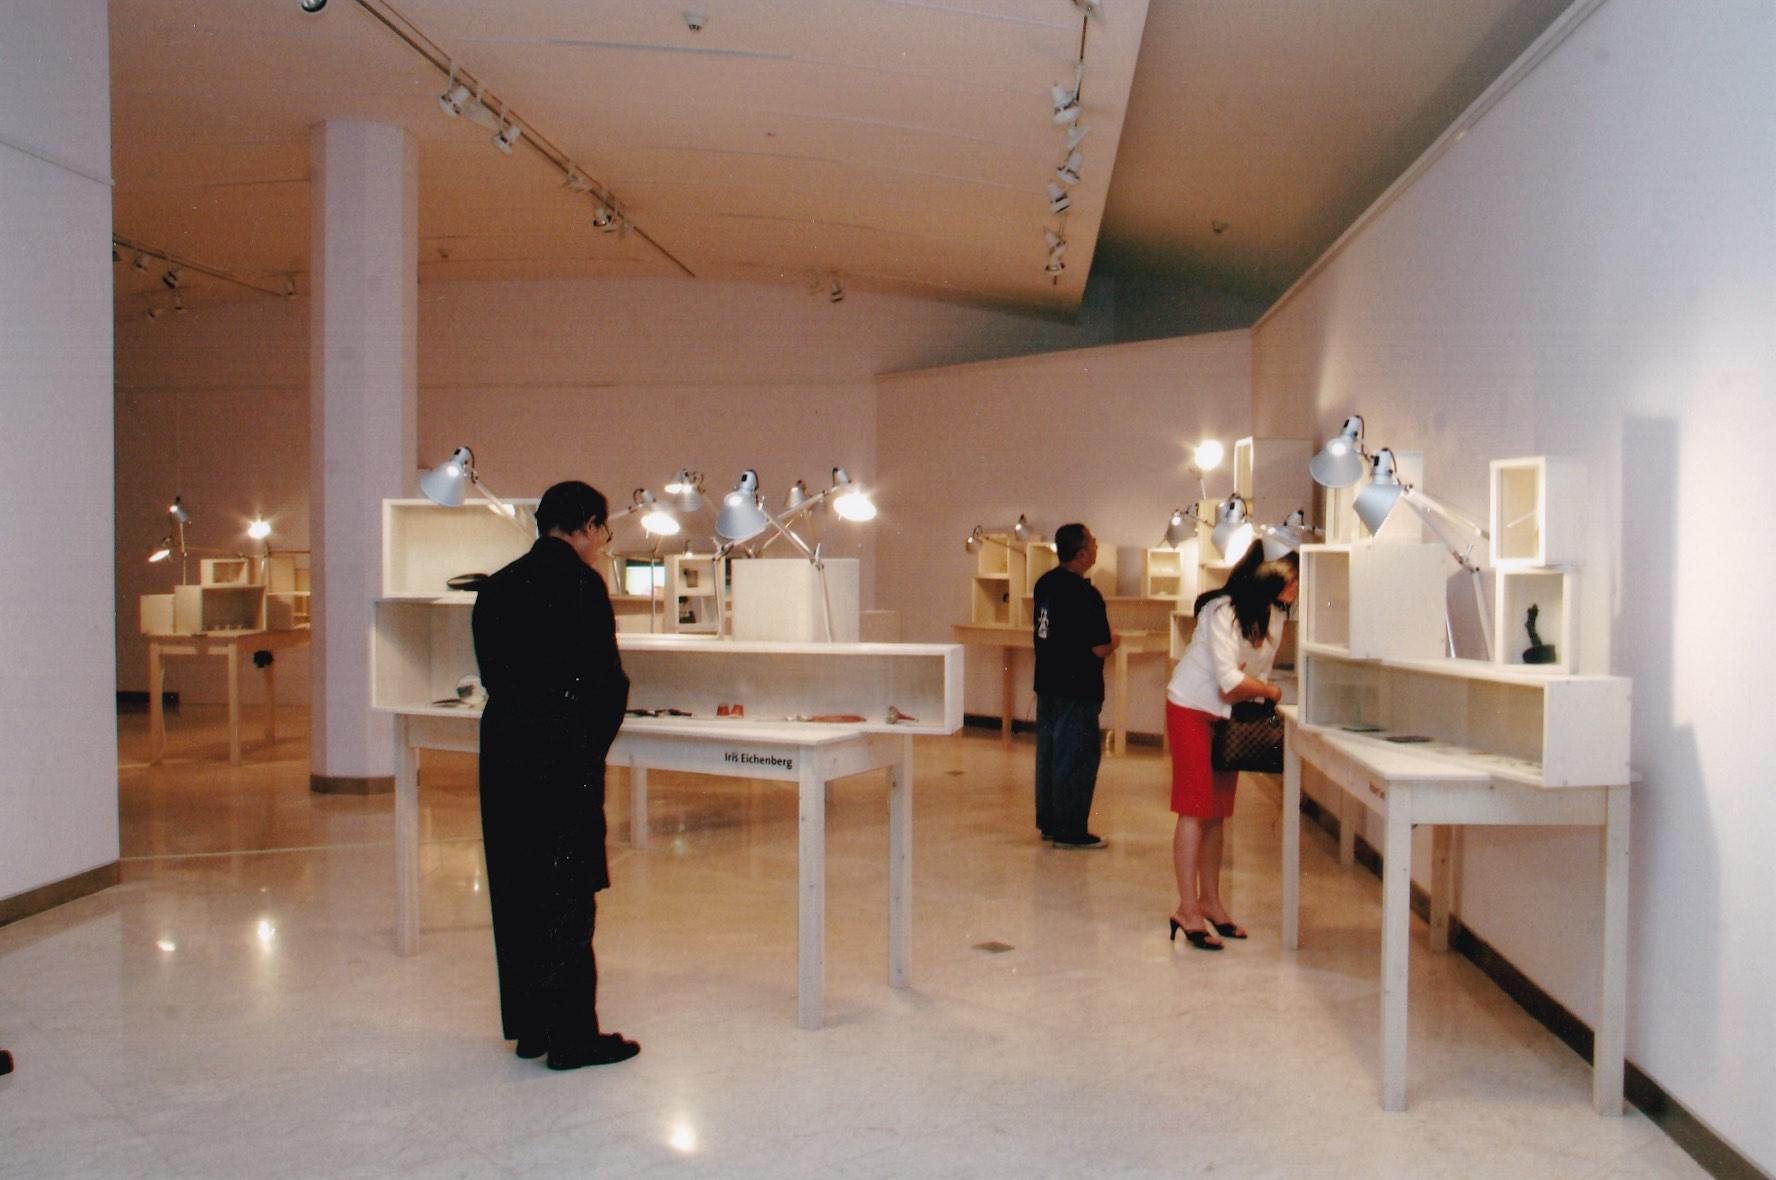 Sterke Verhalen, hedendaagse verhalende sieraden uit Nederland, Erasmus Huis, Jakarta, 2006, tentoonstelling